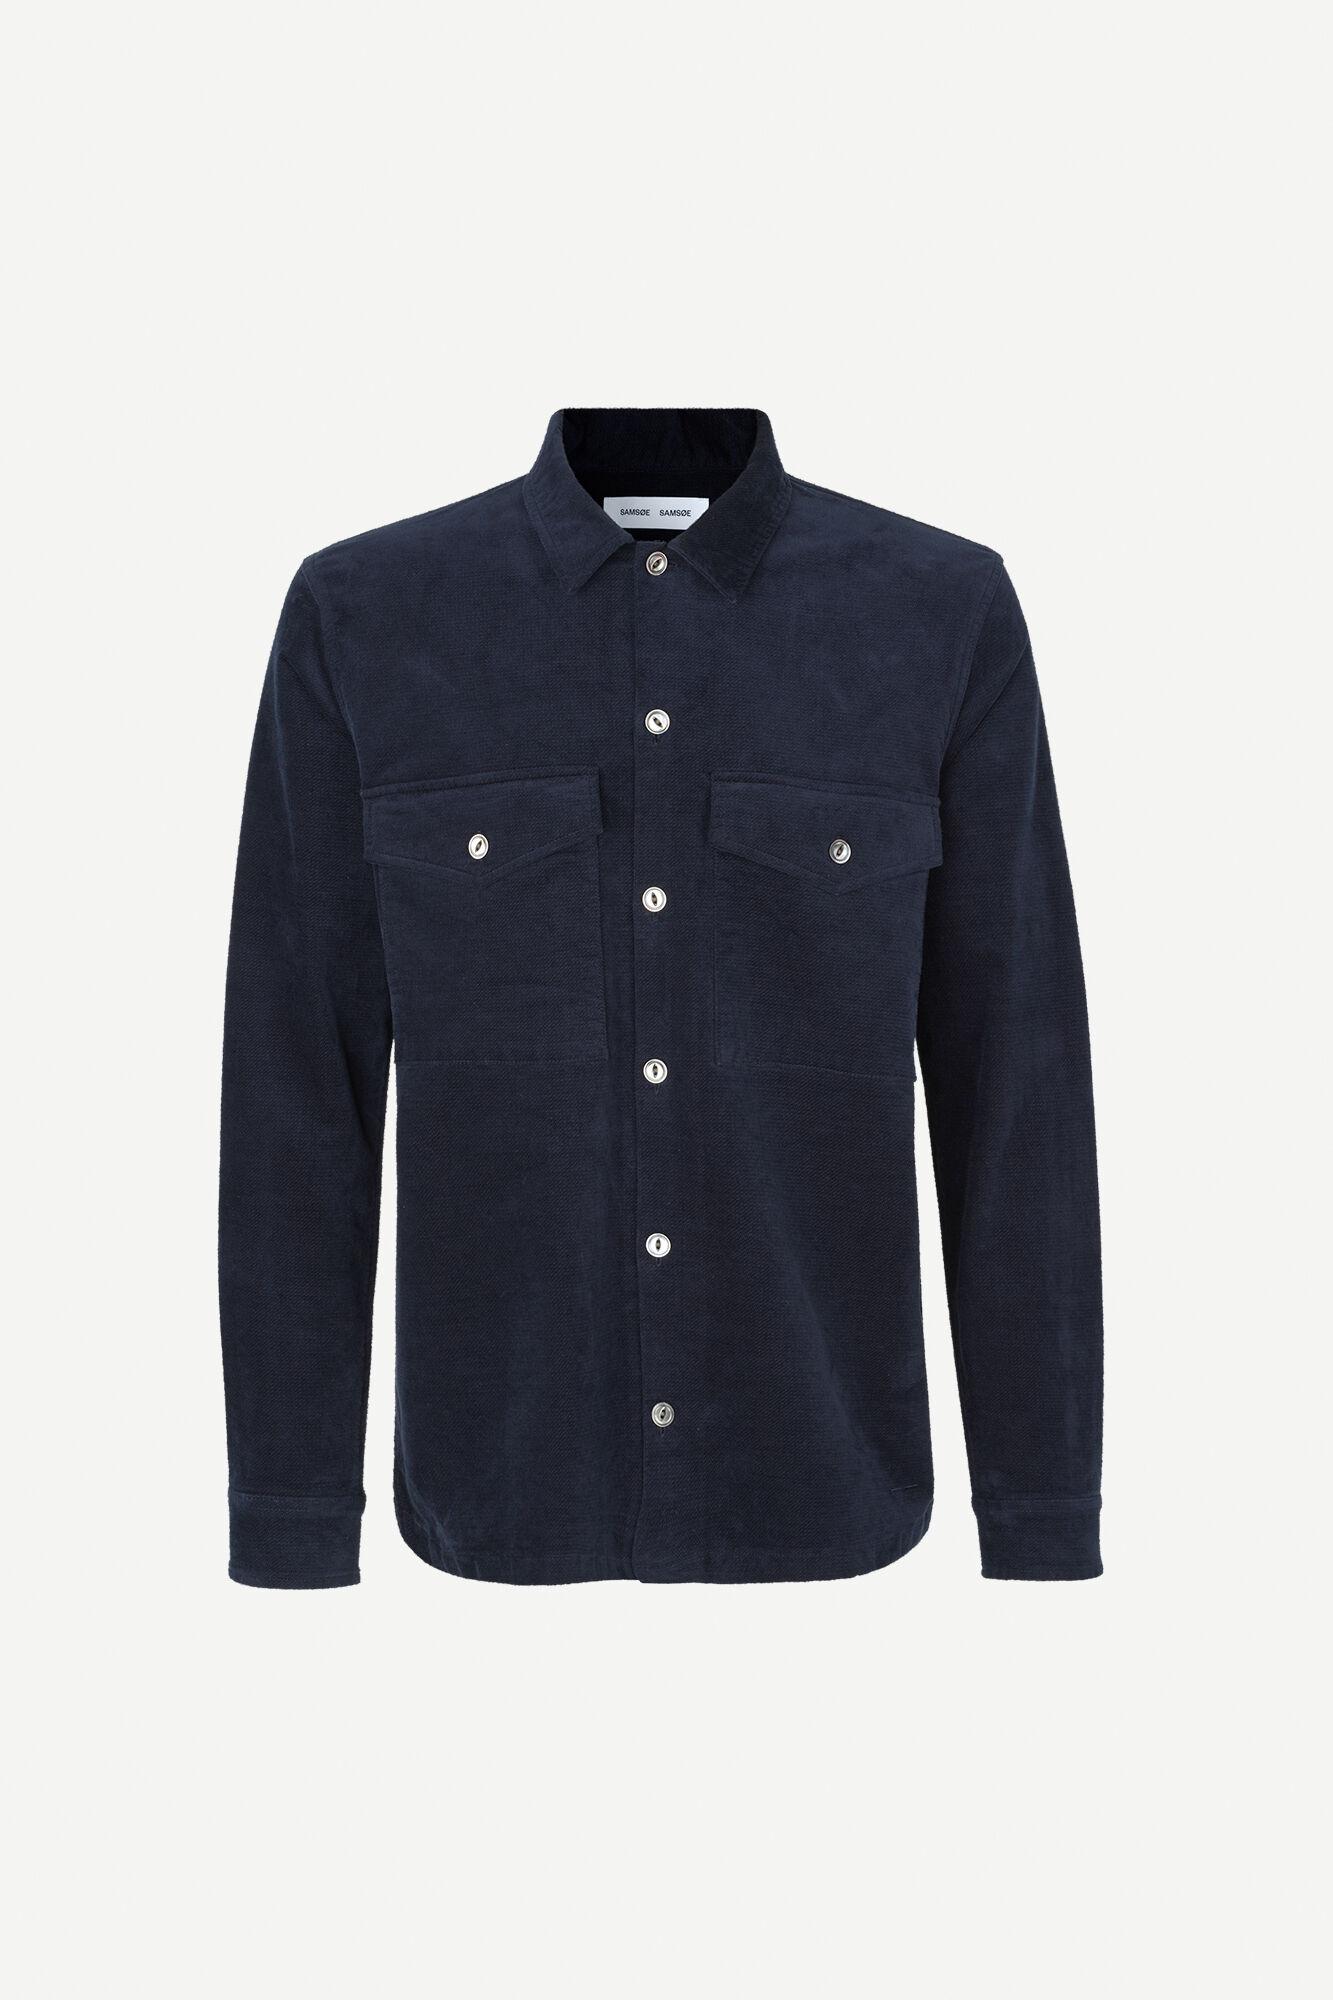 Taka JI shirt 12964, SKY CAPTAIN